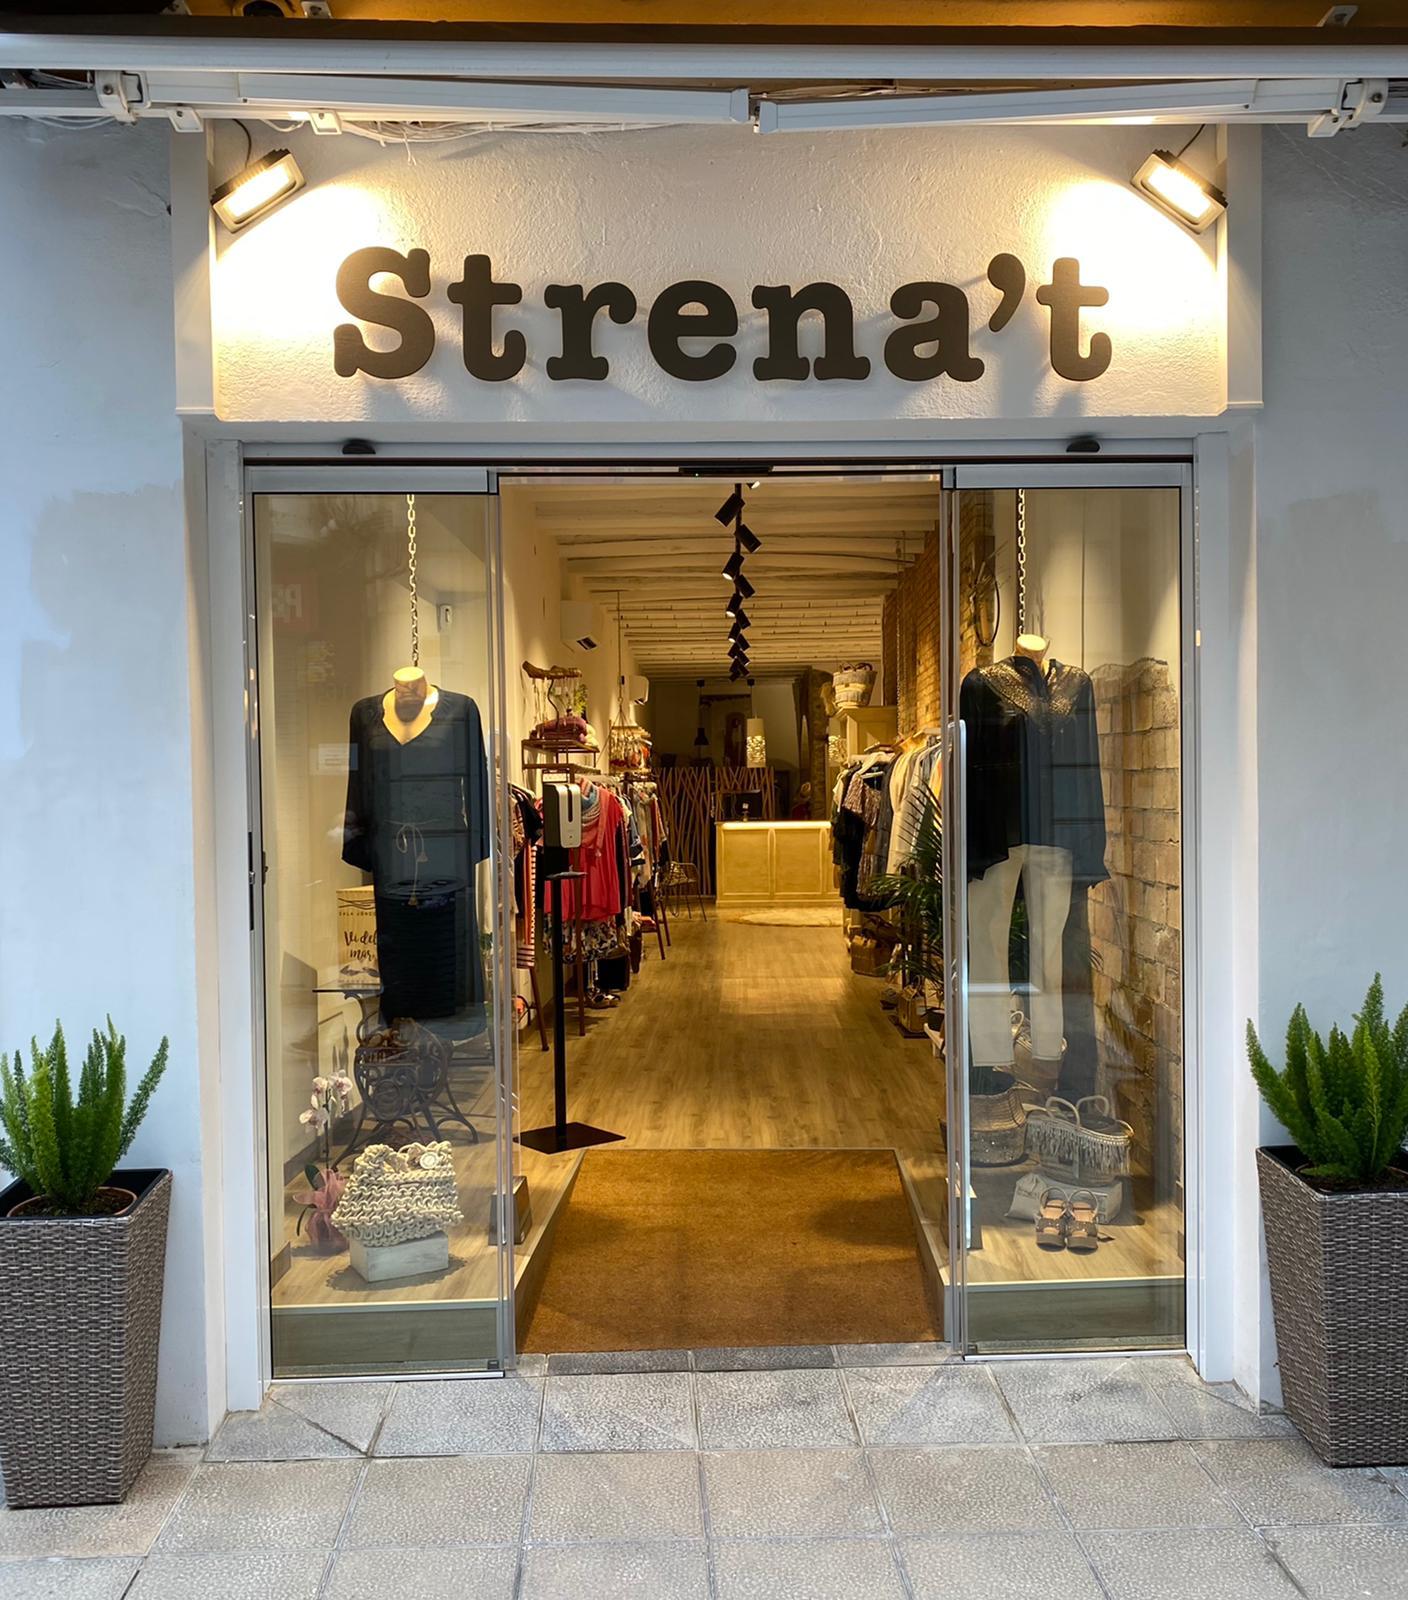 Strena't – Pi i Sunyer